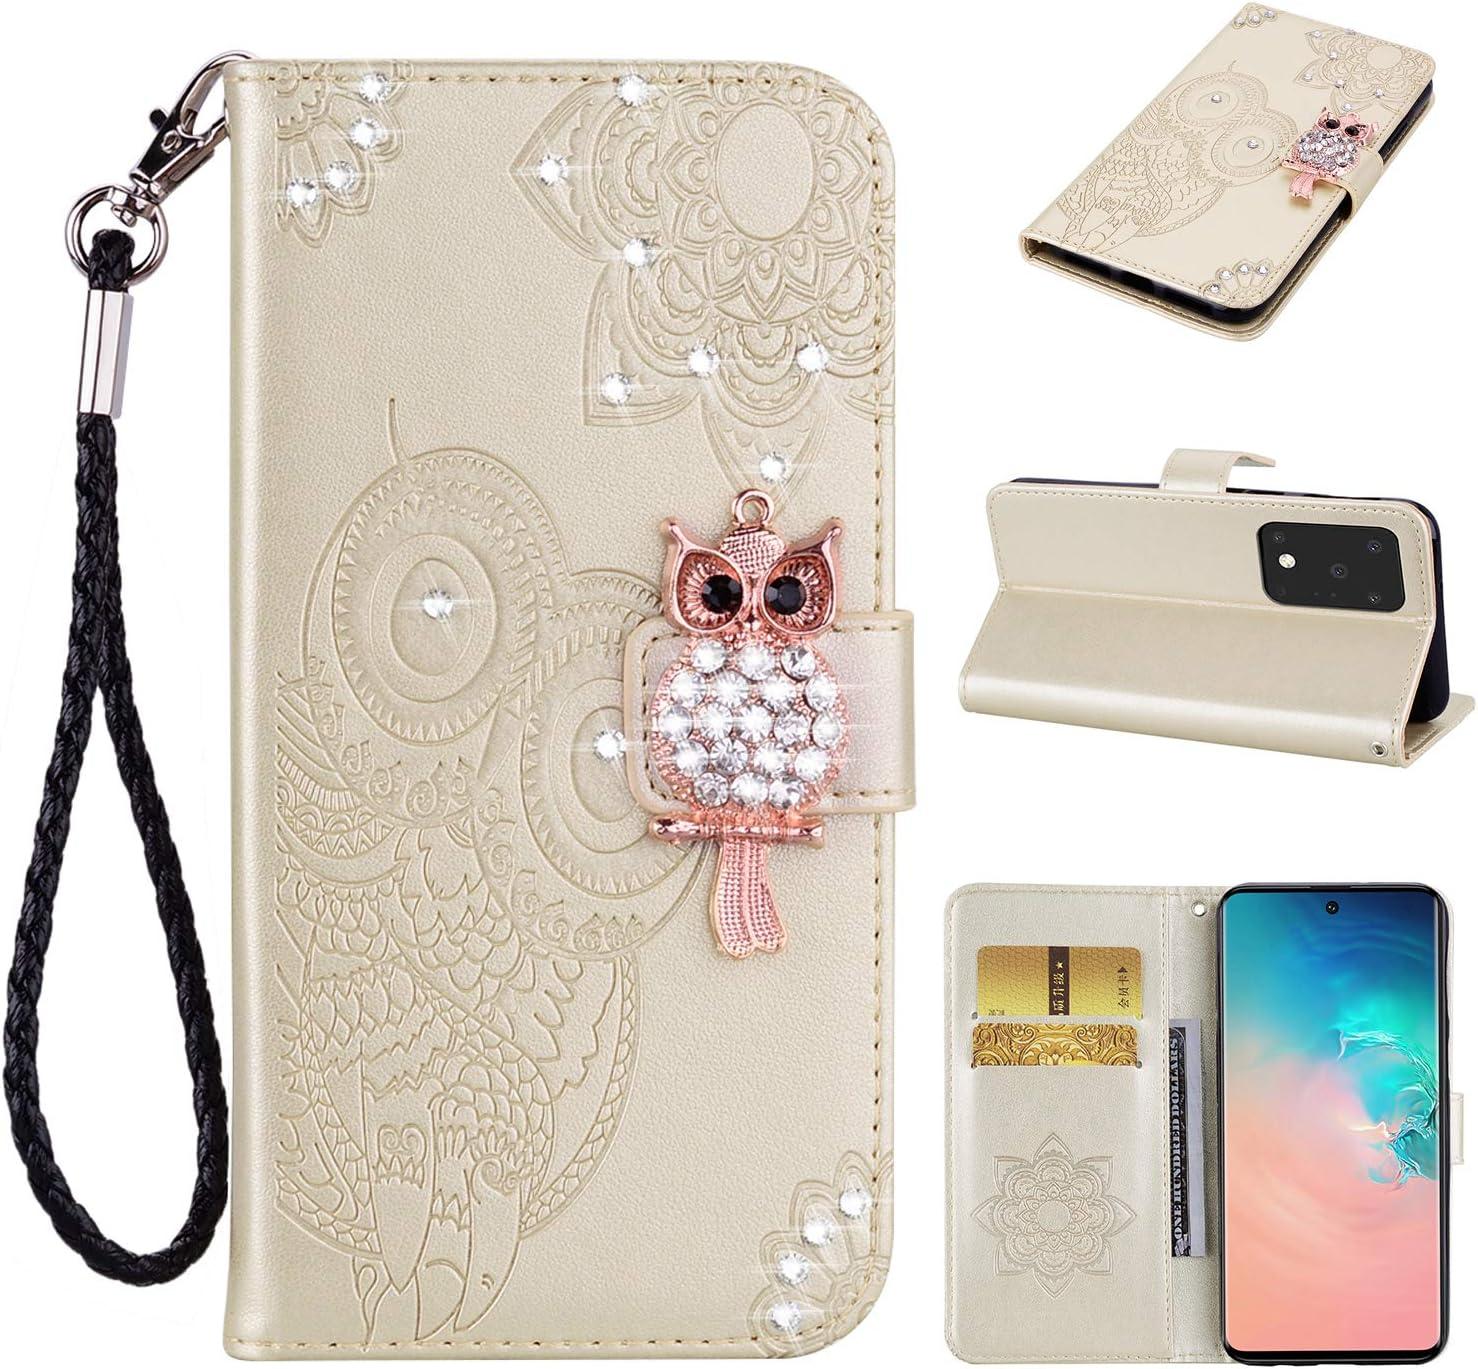 Cfrau Diamond Kickstand Case with for Samsung Stylus Max 55% OFF Fees free Black Galax